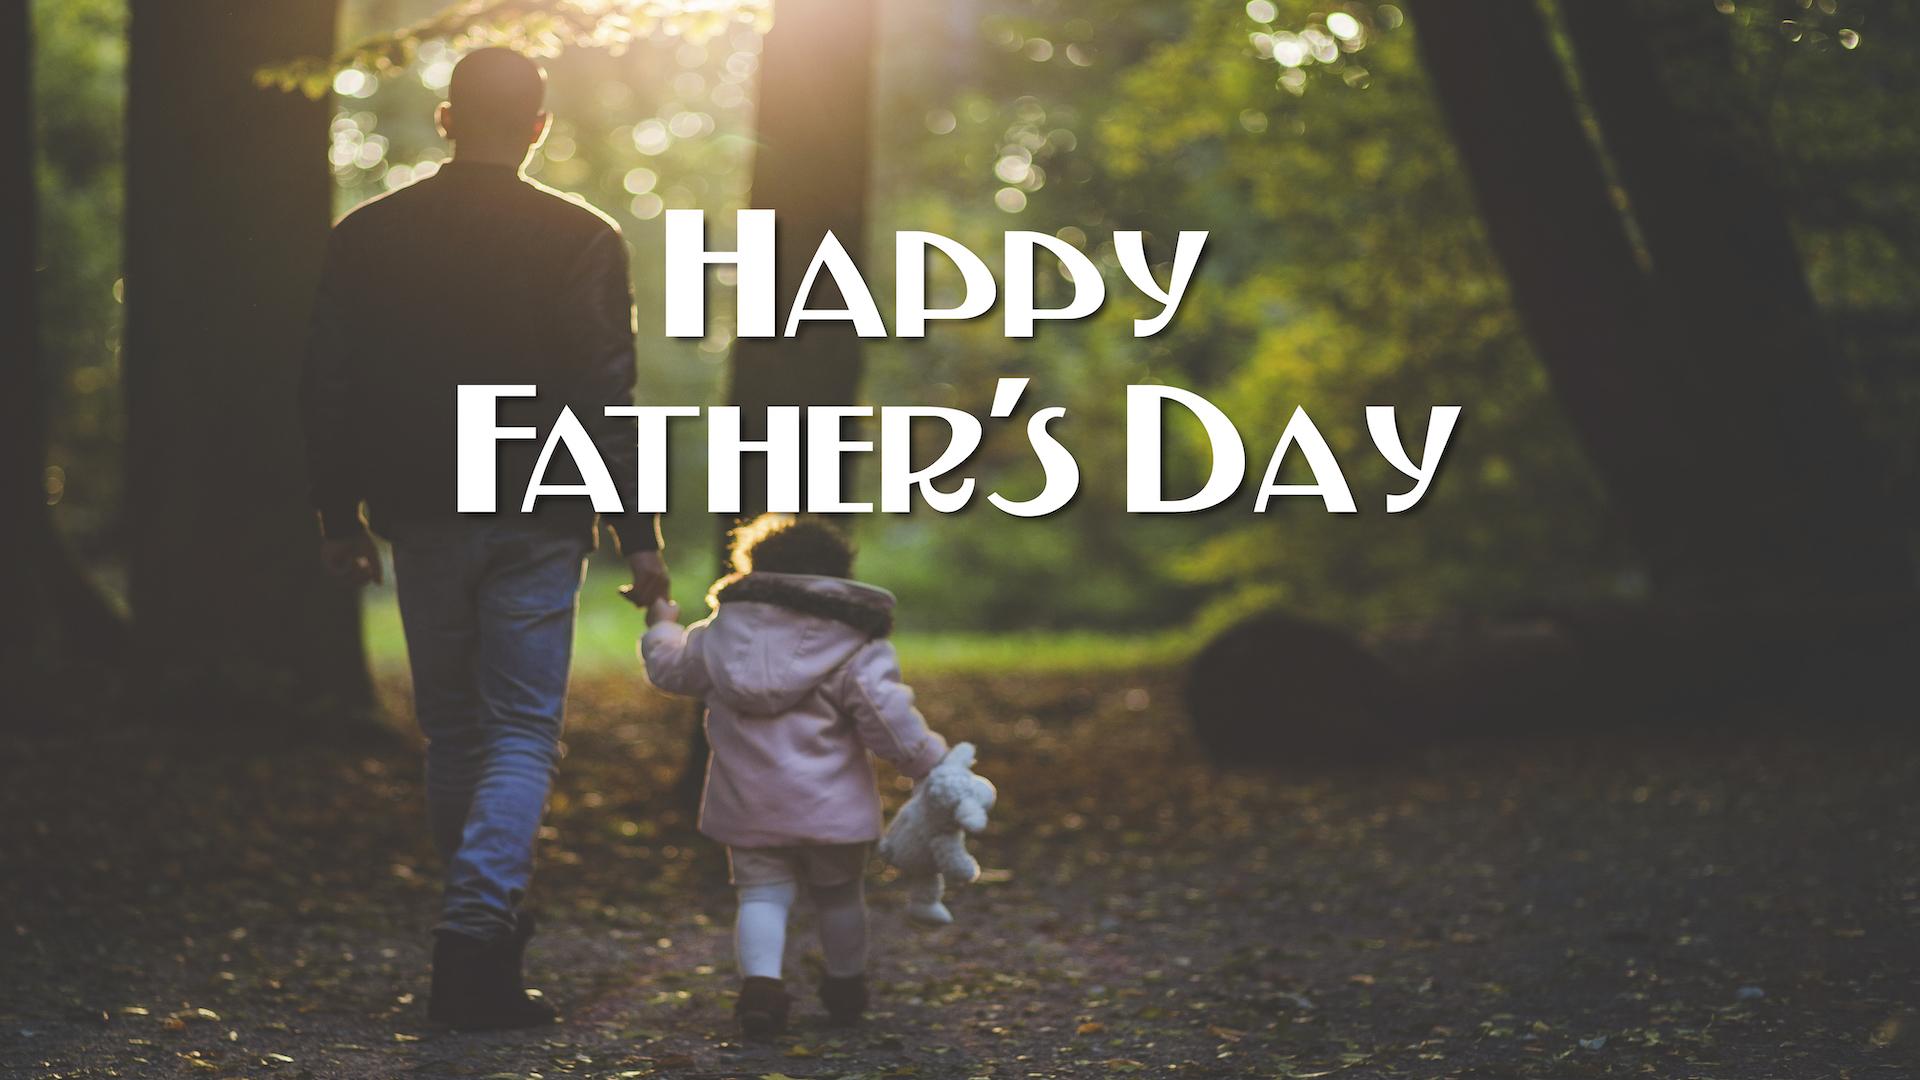 fathersdayslide.jpg